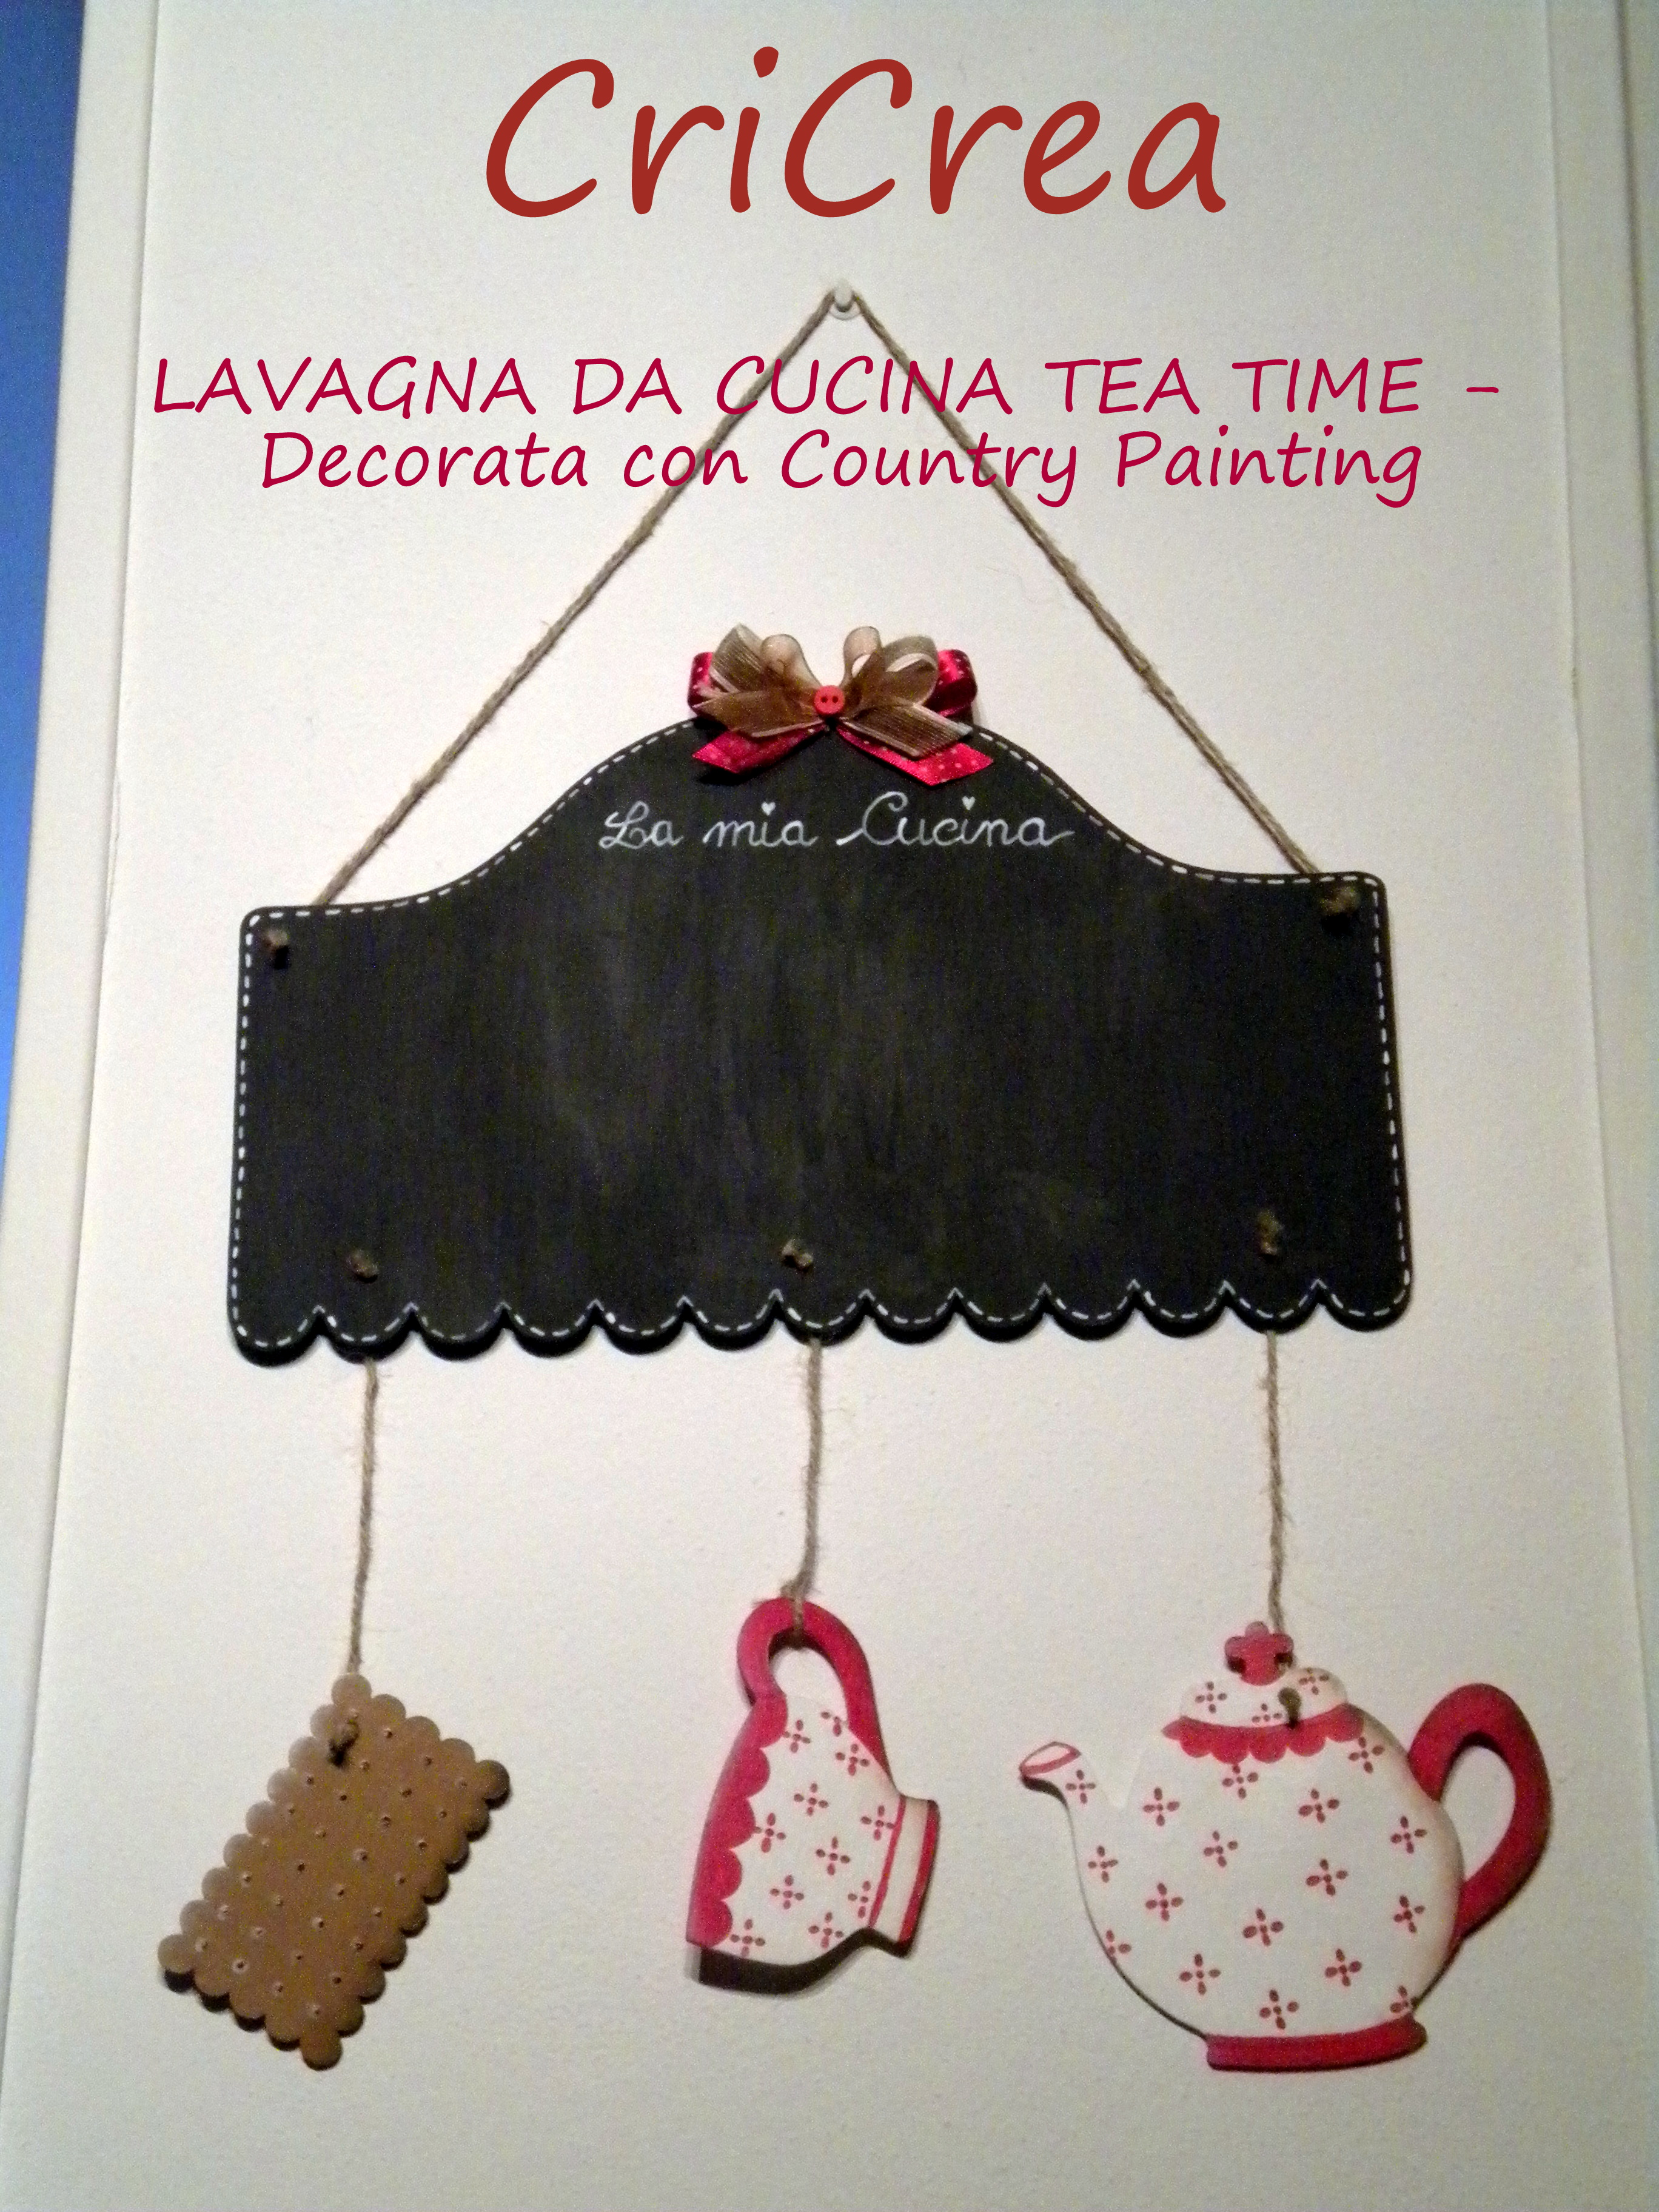 Lavagna da cucina tea time decorata con country painting - Lavagna da cucina ...